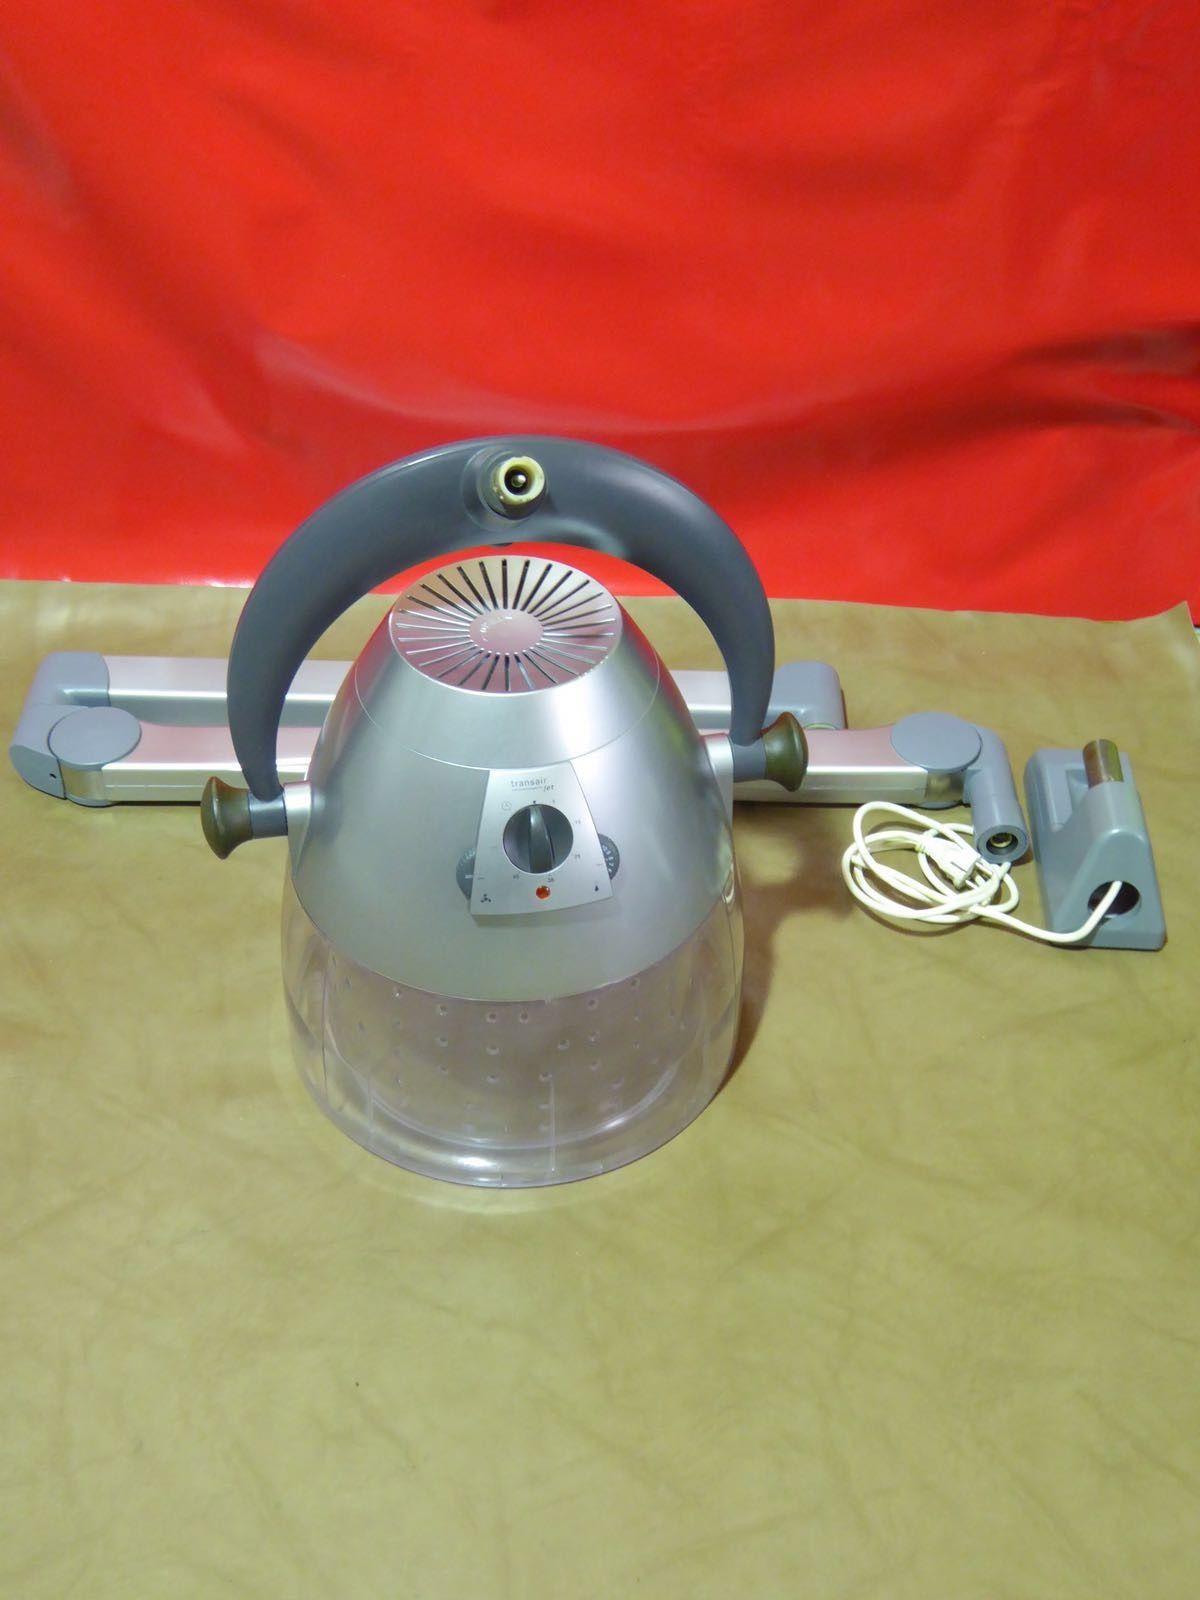 Kadus Transair Trockenhaube (Silber) Image